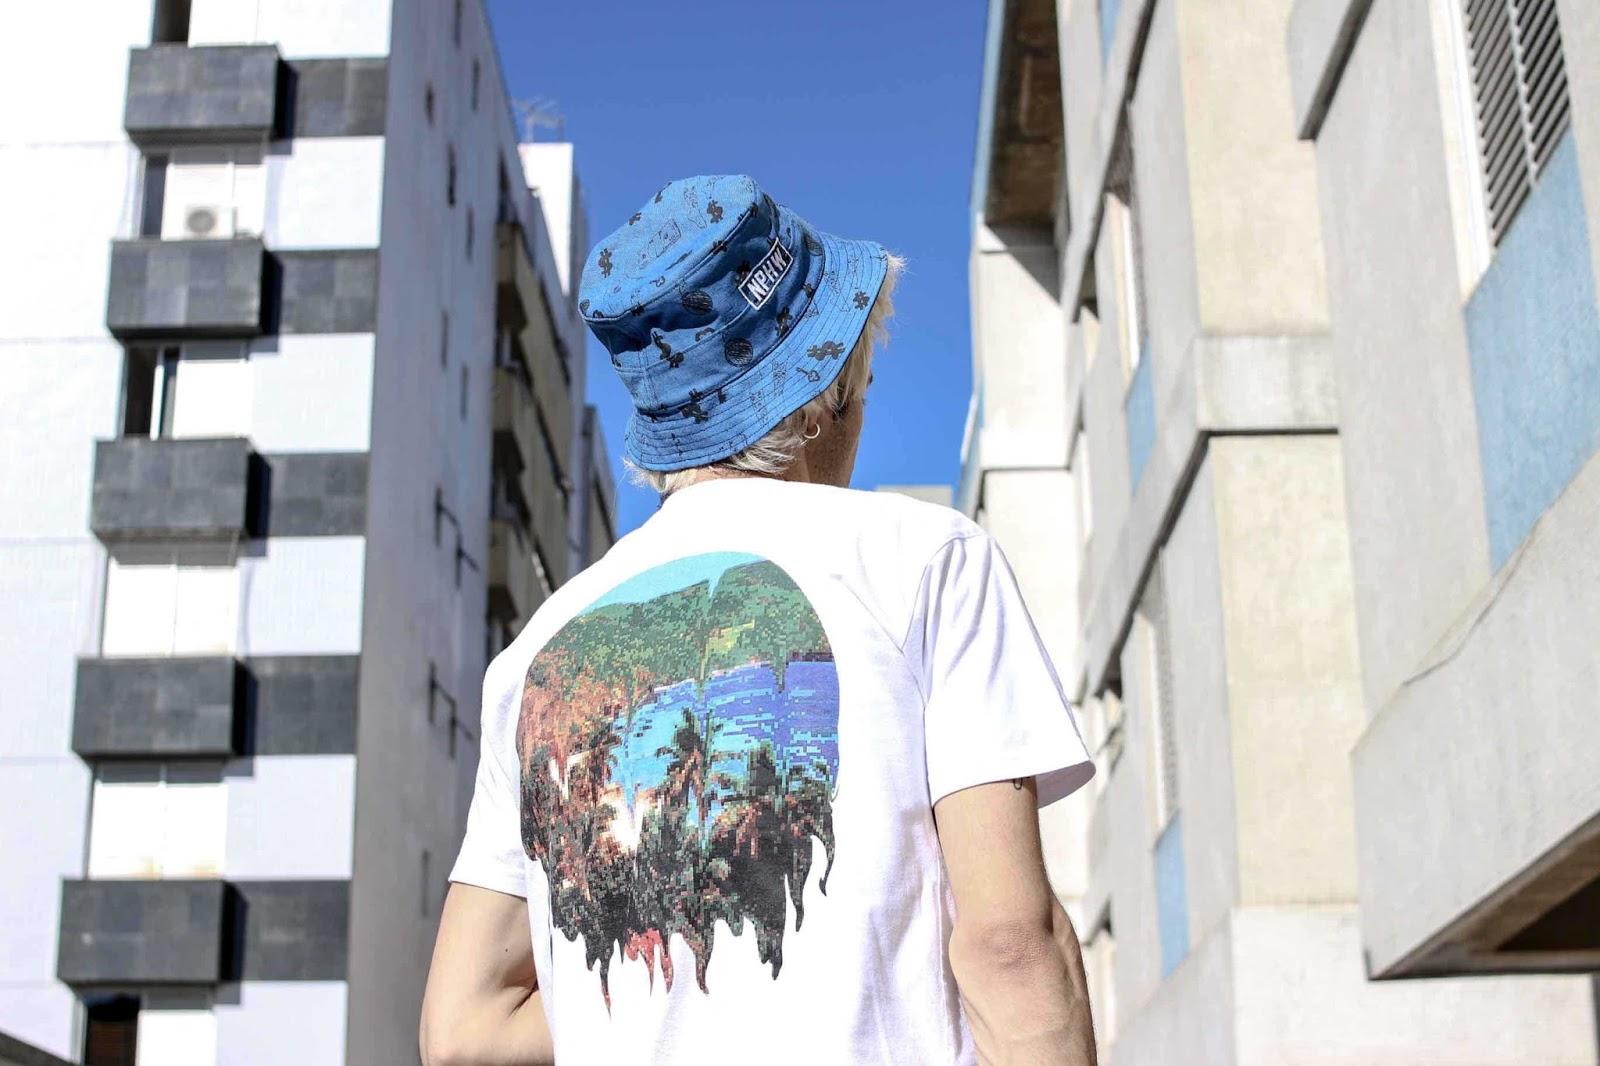 supatramp streetwear brasil 10 - Conheça a marca brasileira Supatramp